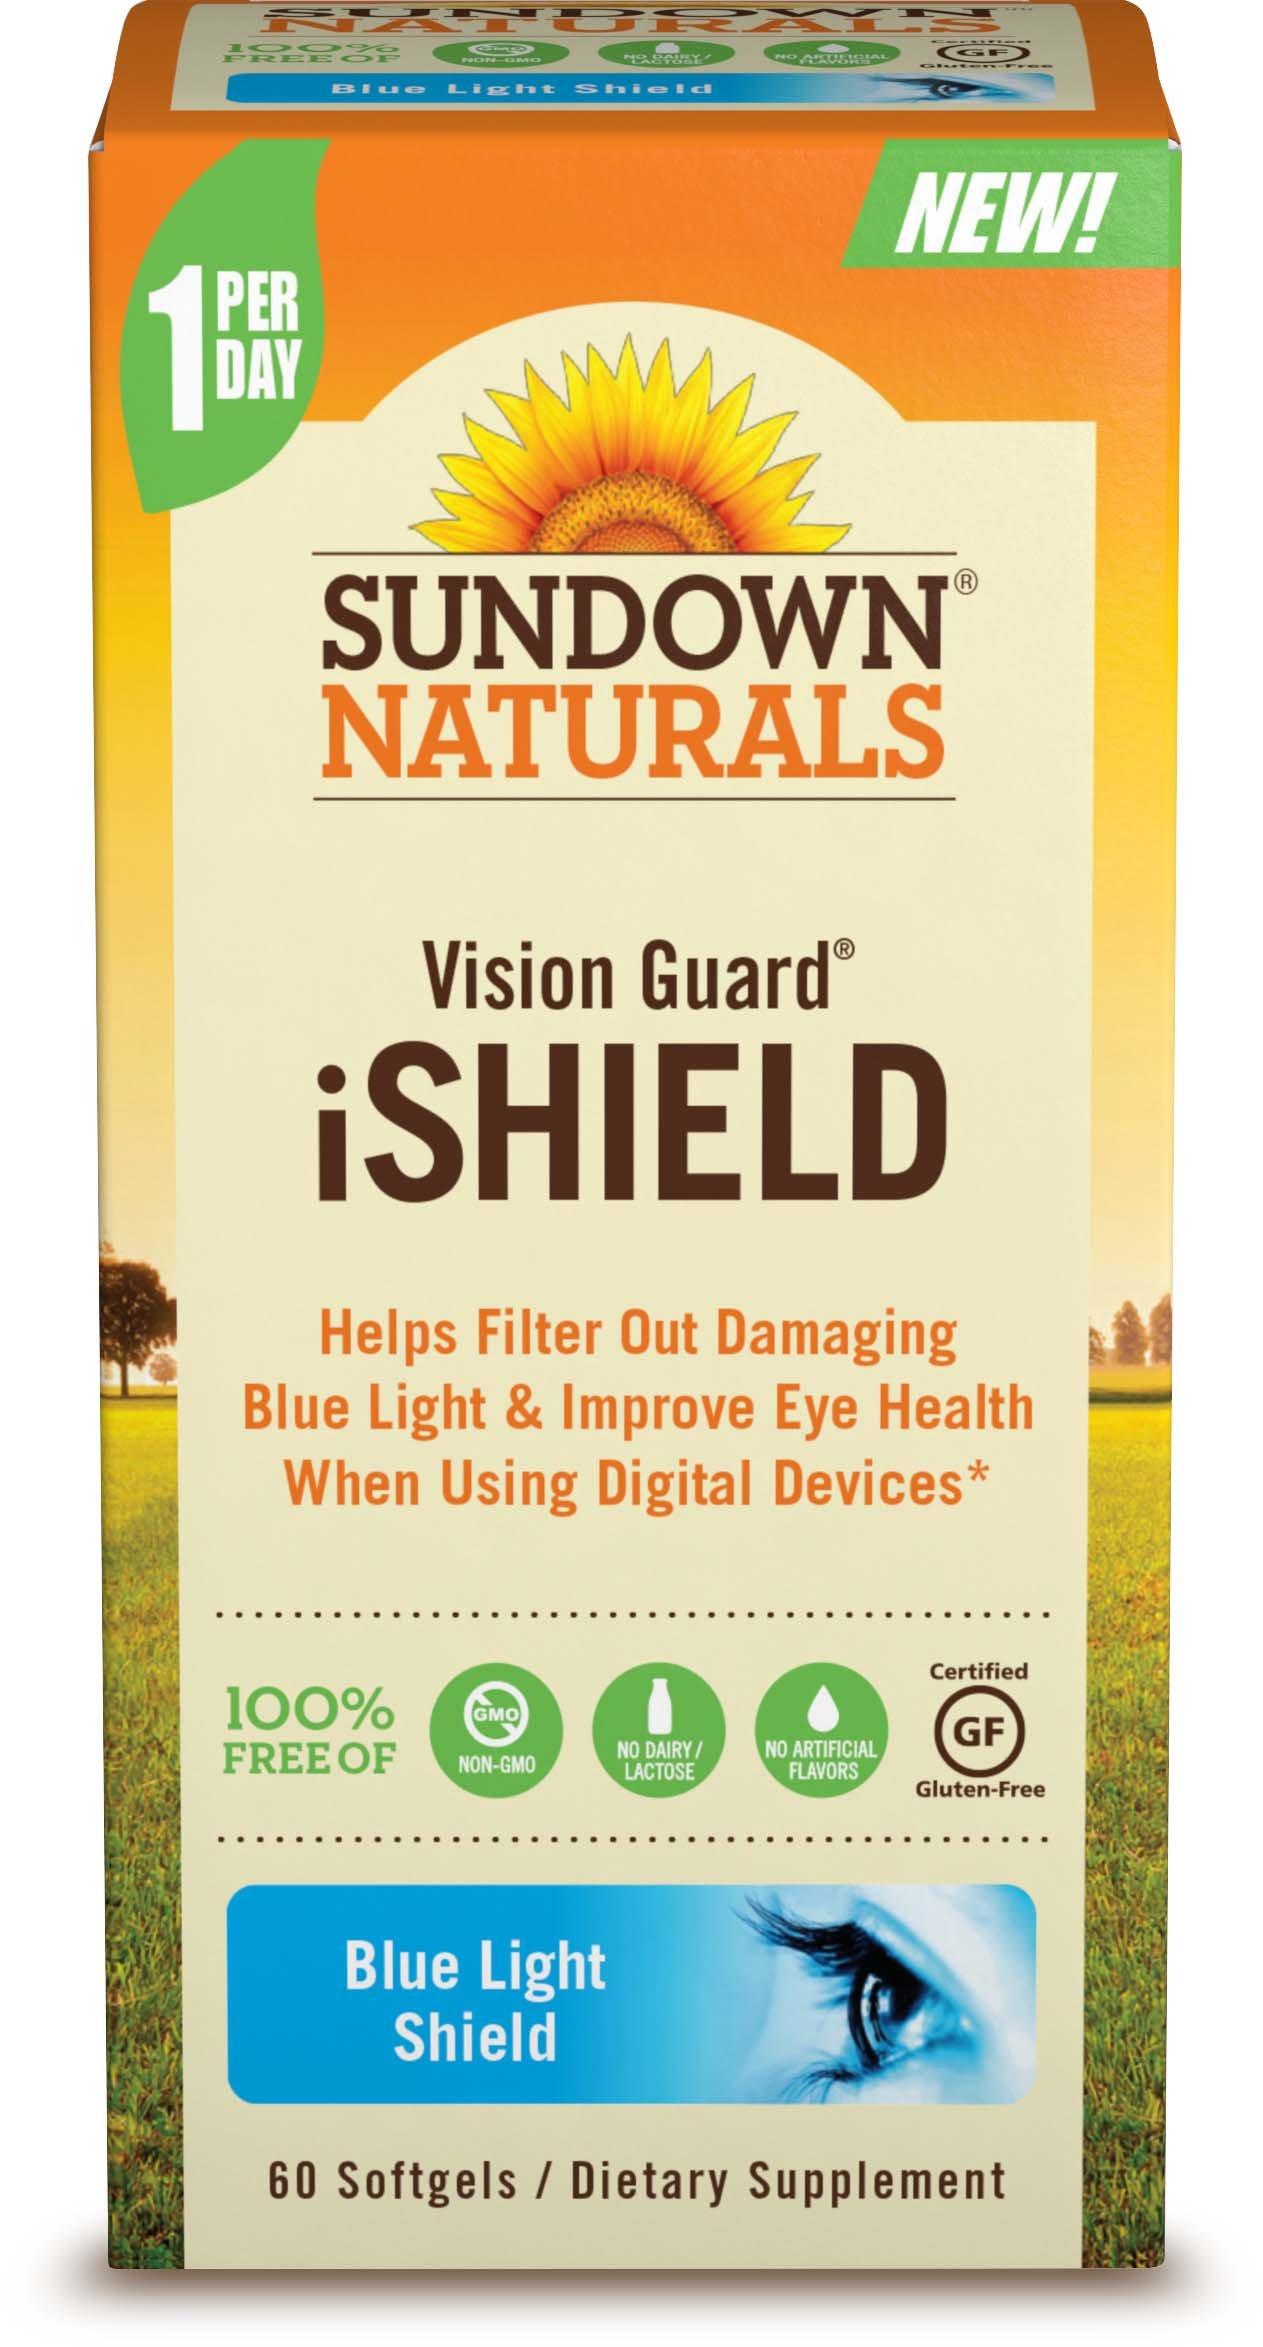 Sundown Naturals Vision Guard Ishield Softgels, 60 Count